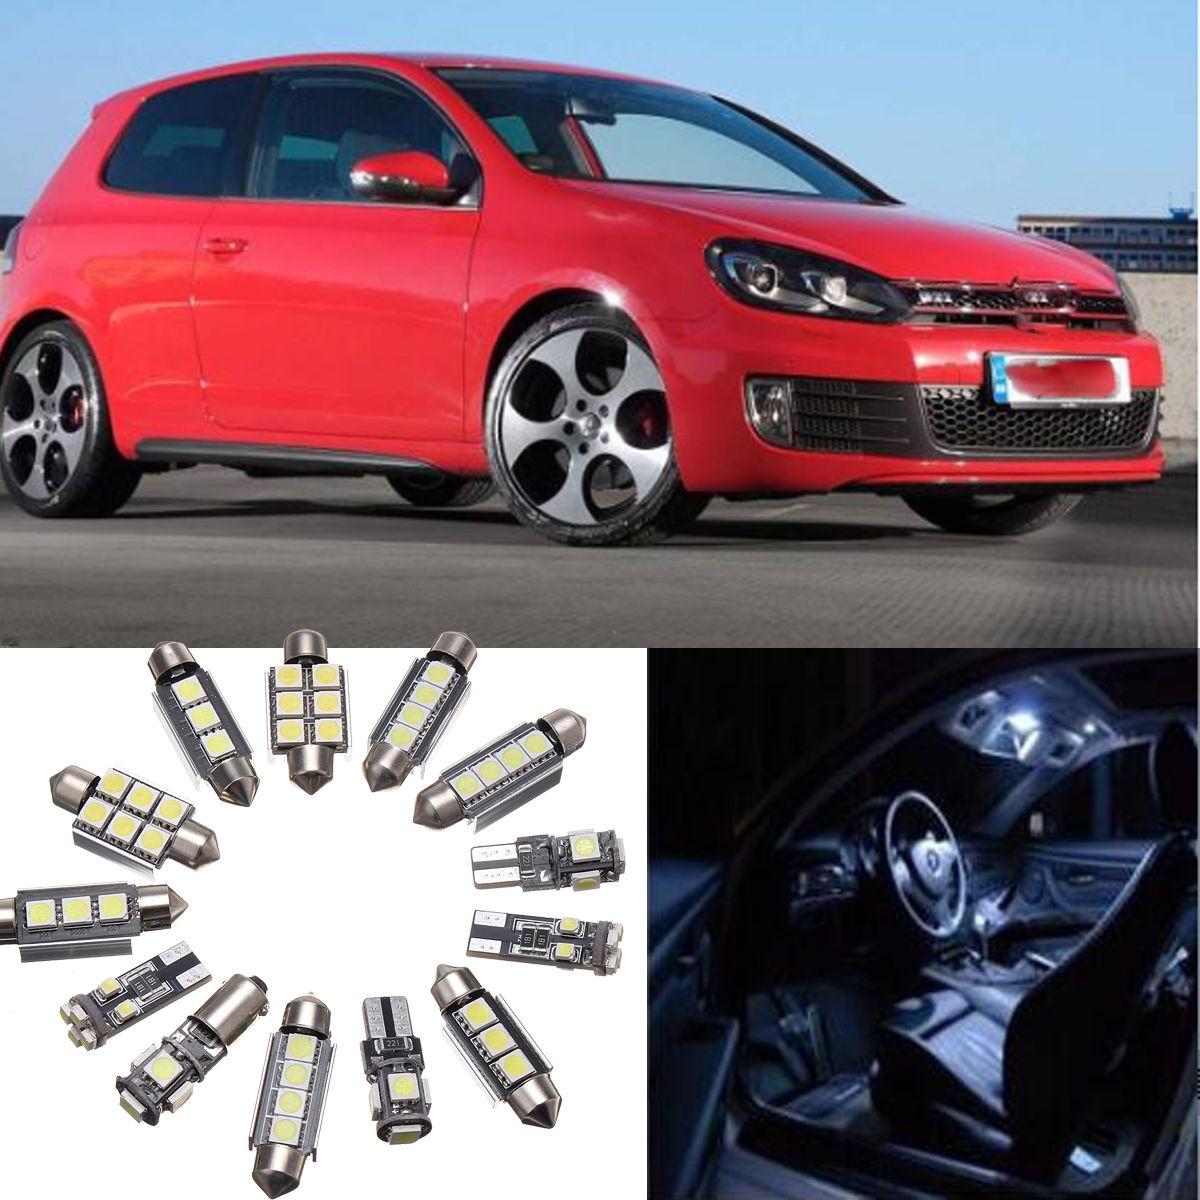 JX-LCLYL 13 Uds blanco luz LED para Interior de coche bombilla Kit para VW Golf 6 MK6 GTI 2010-2015